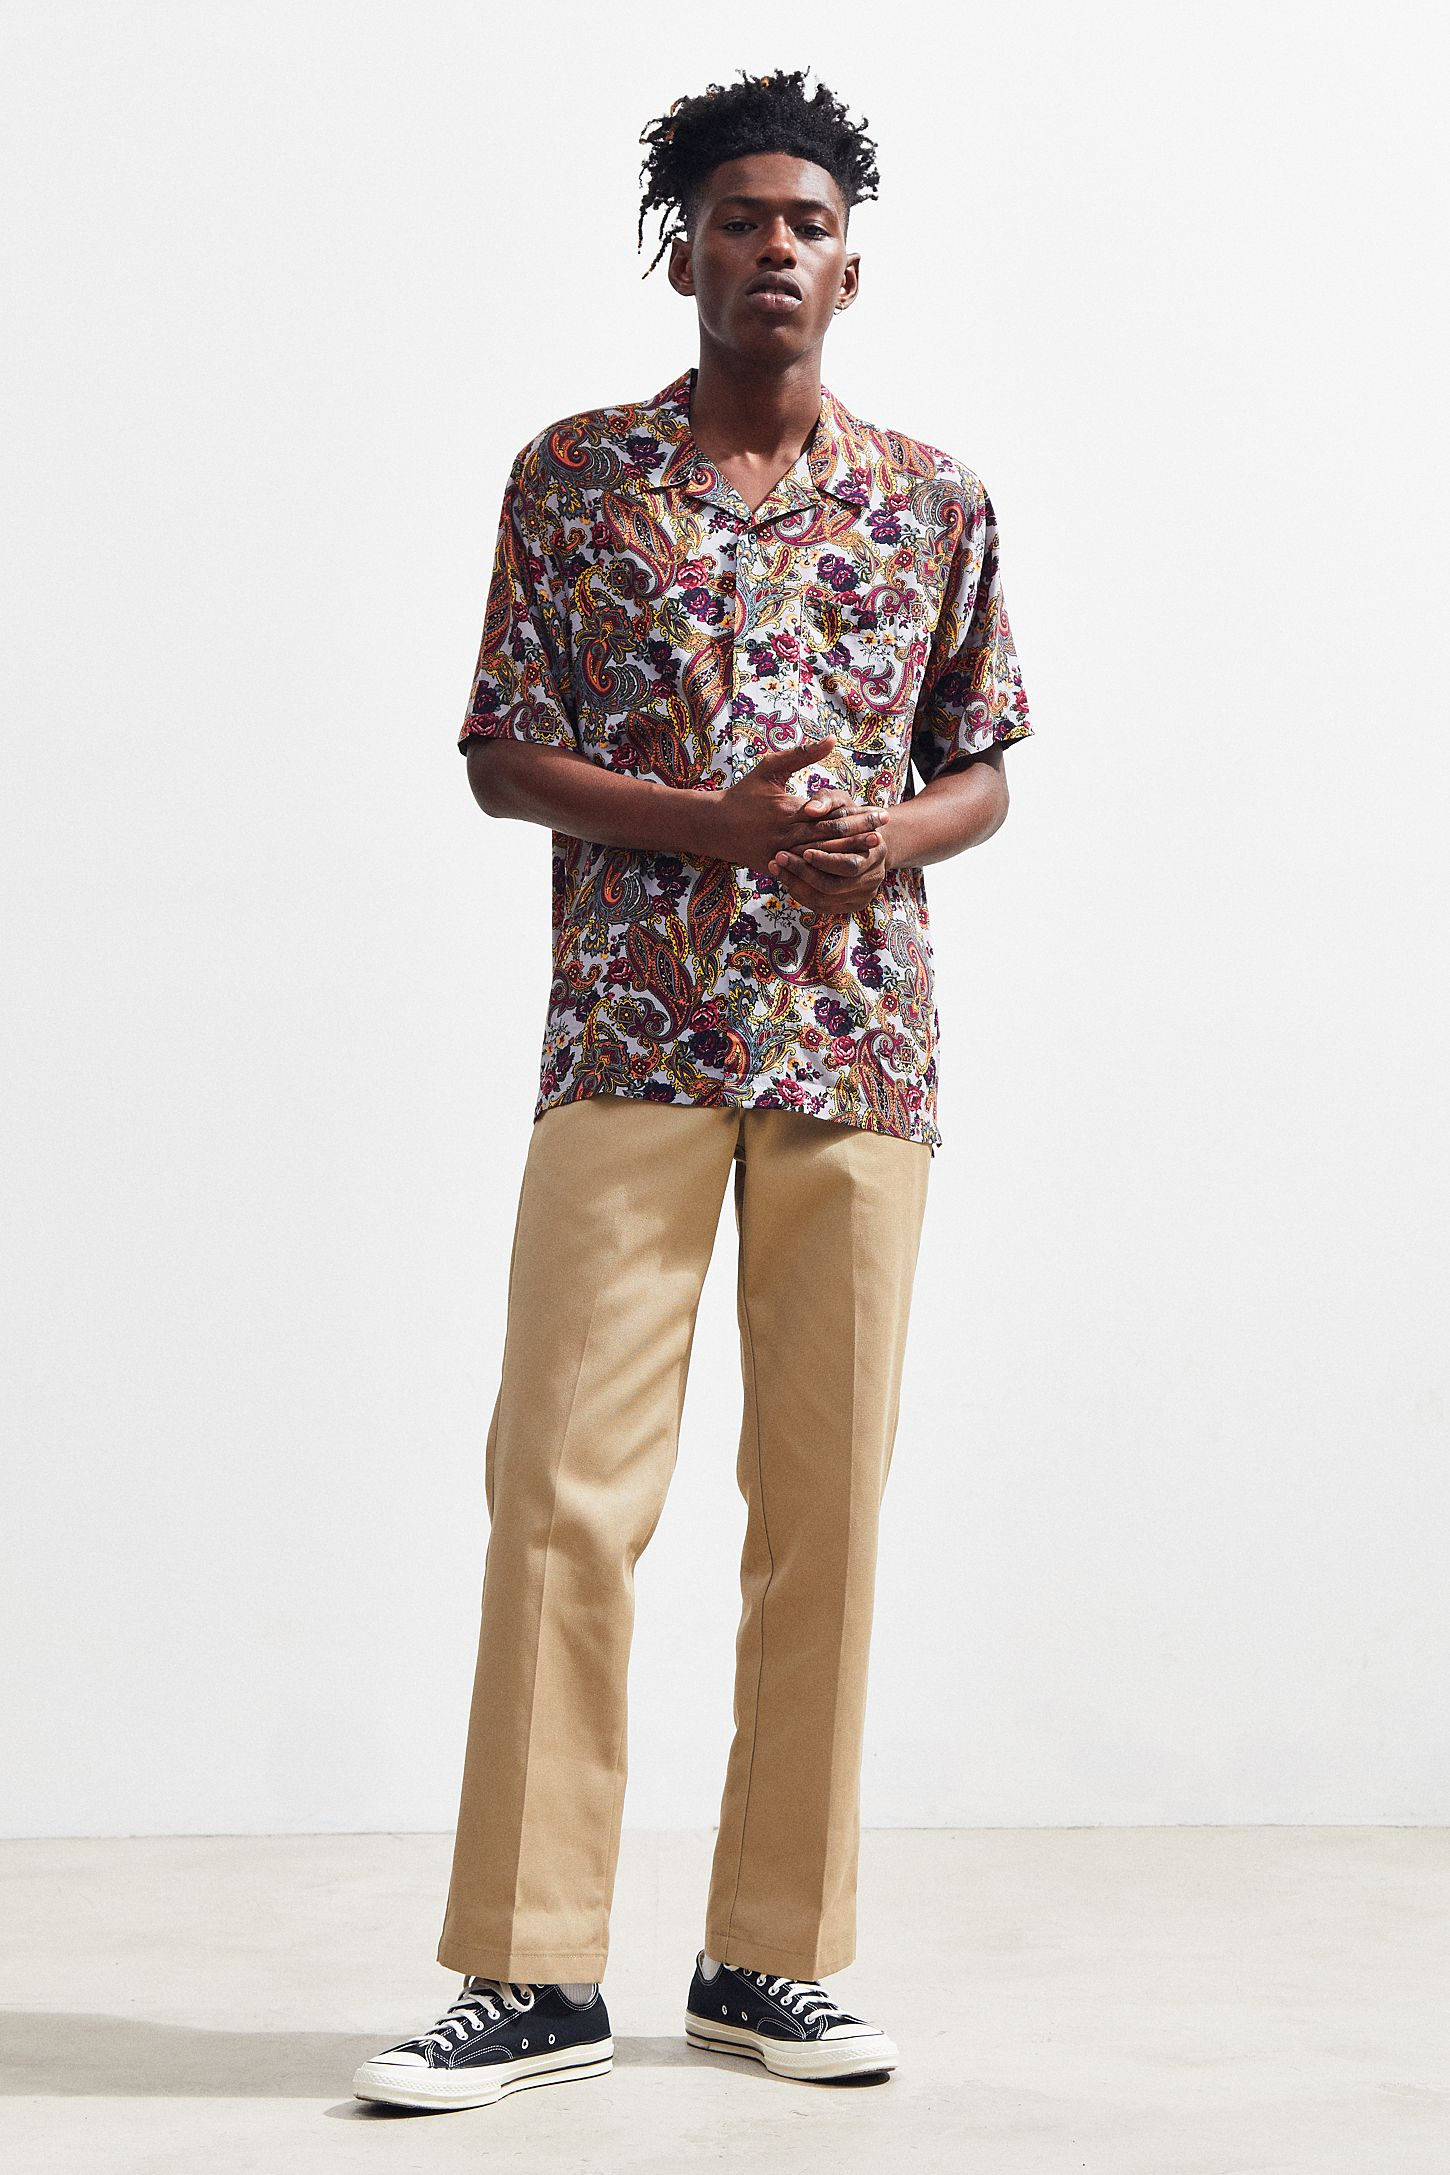 Uo Ornate Paisley Rayon Short Sleeve Button Down Shirt Urban